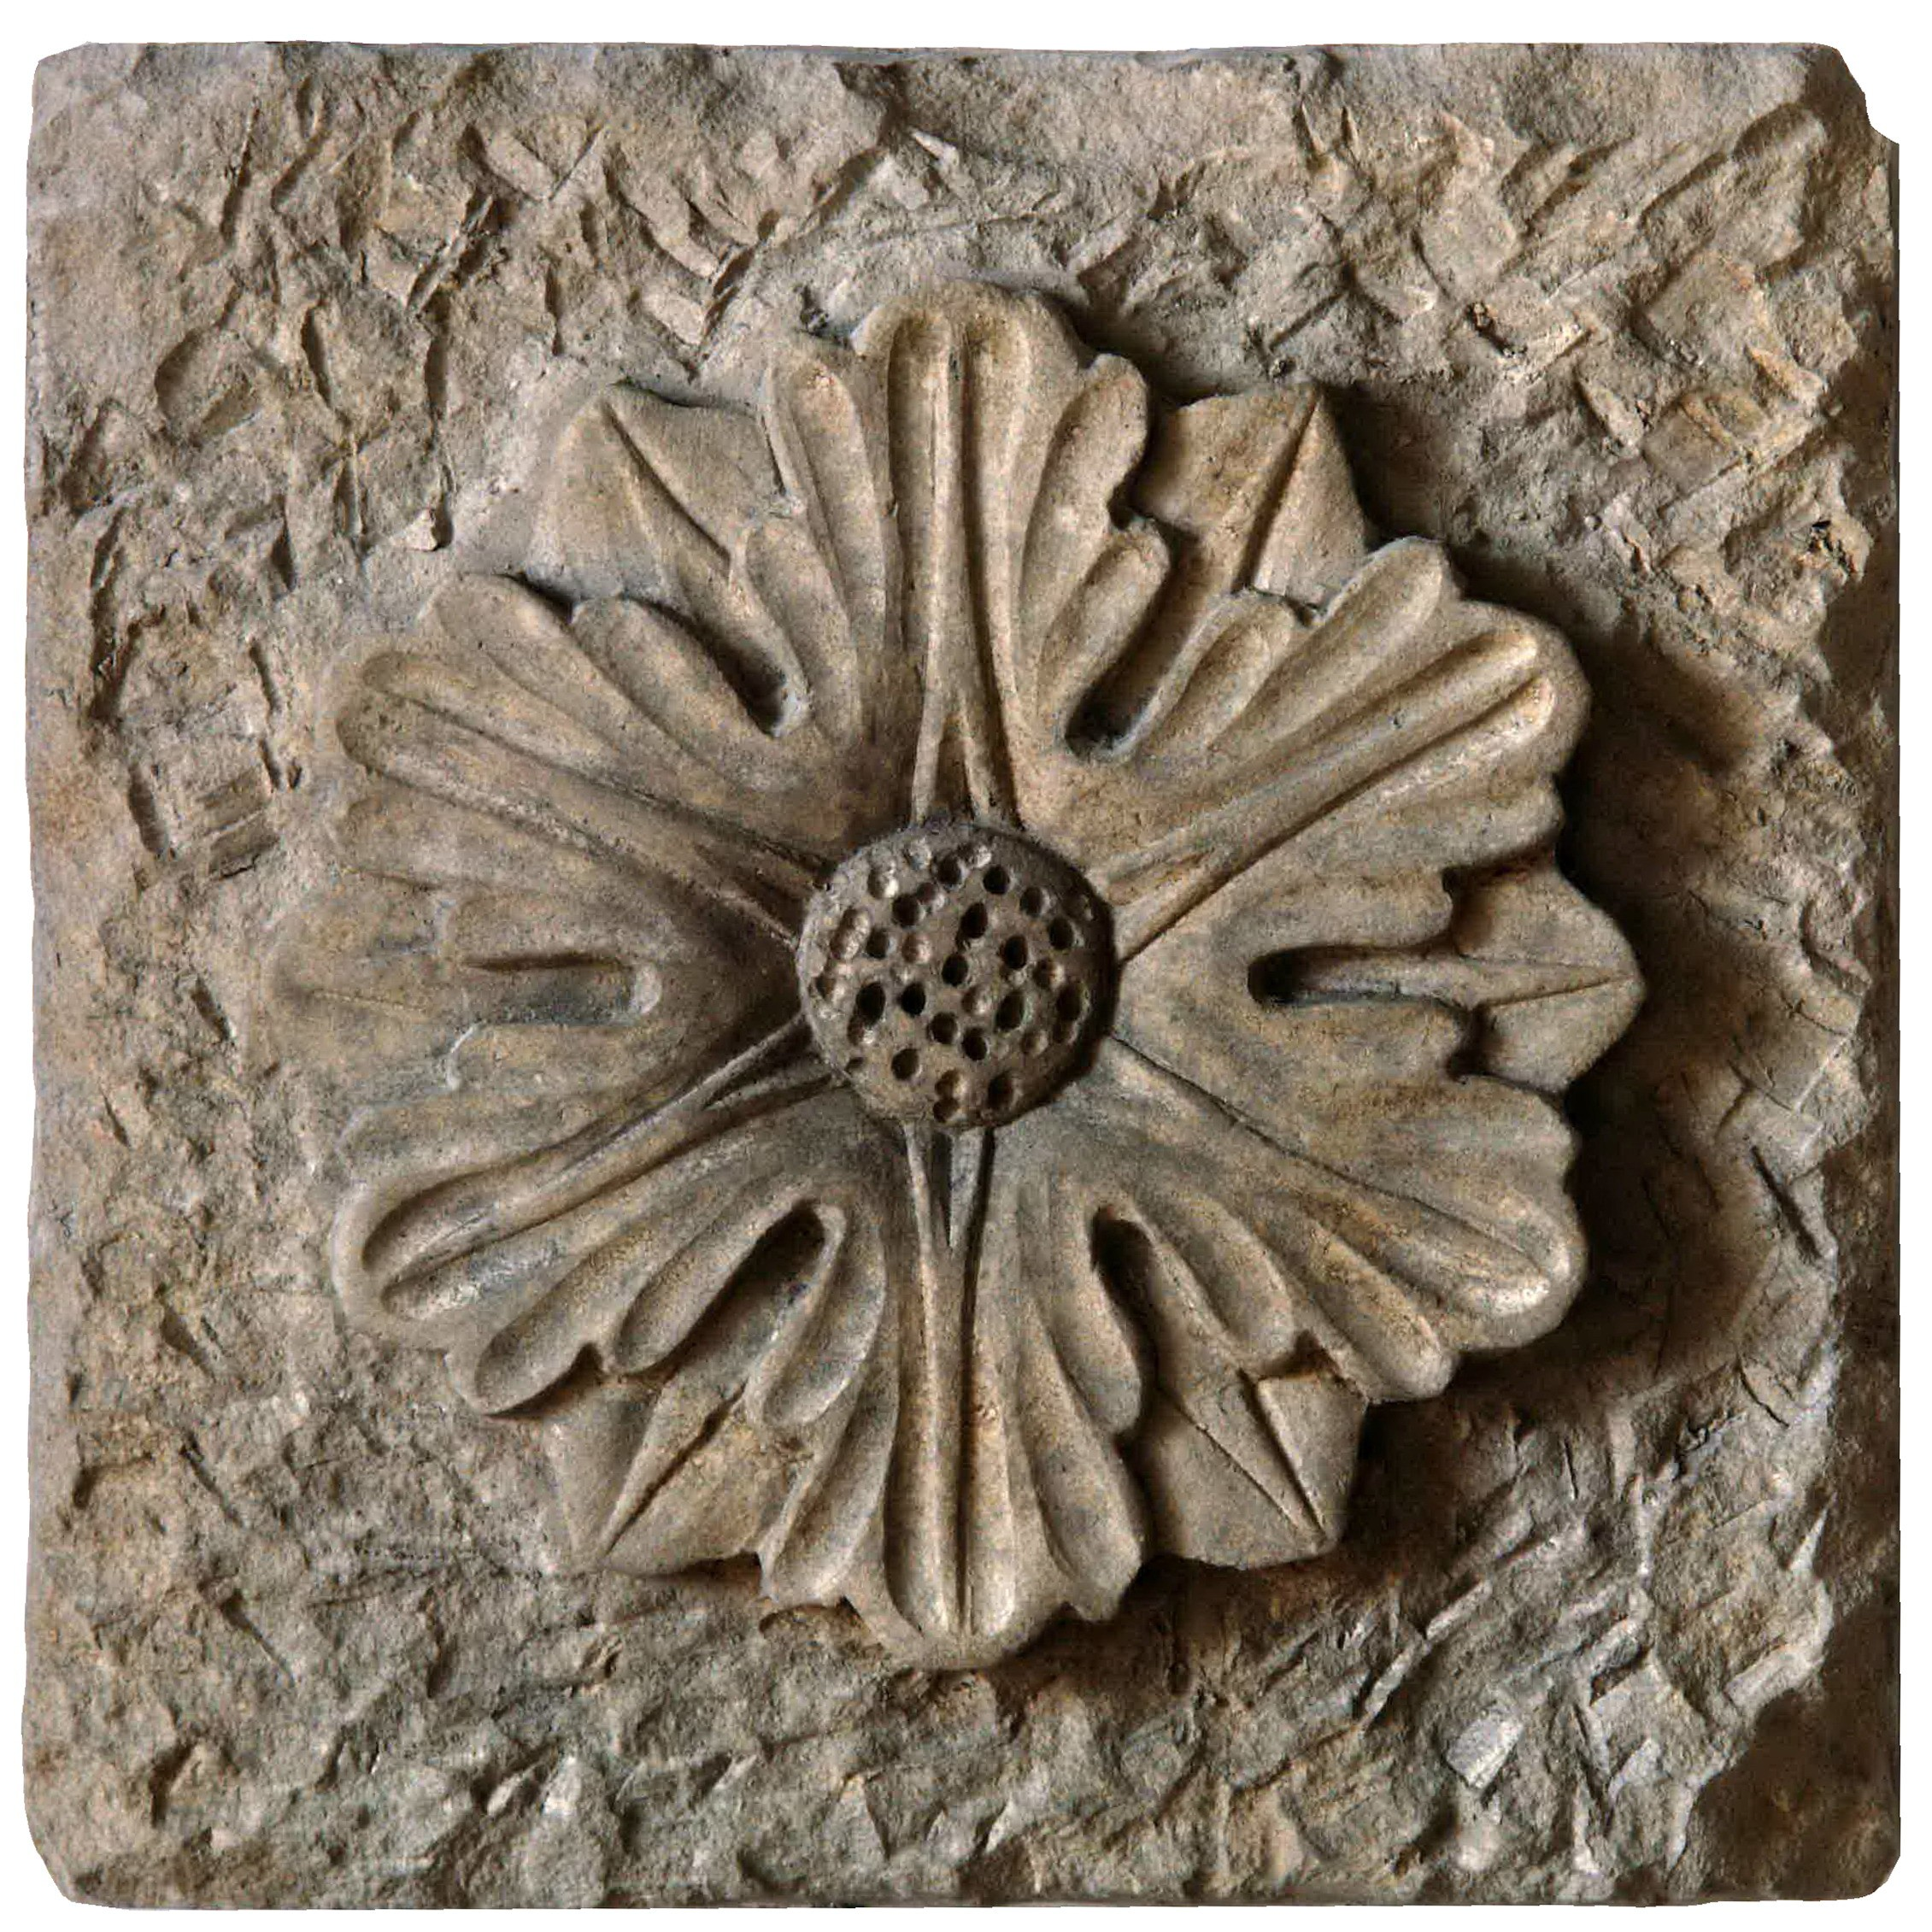 Formelle flowers rosettes and friezes recuperando